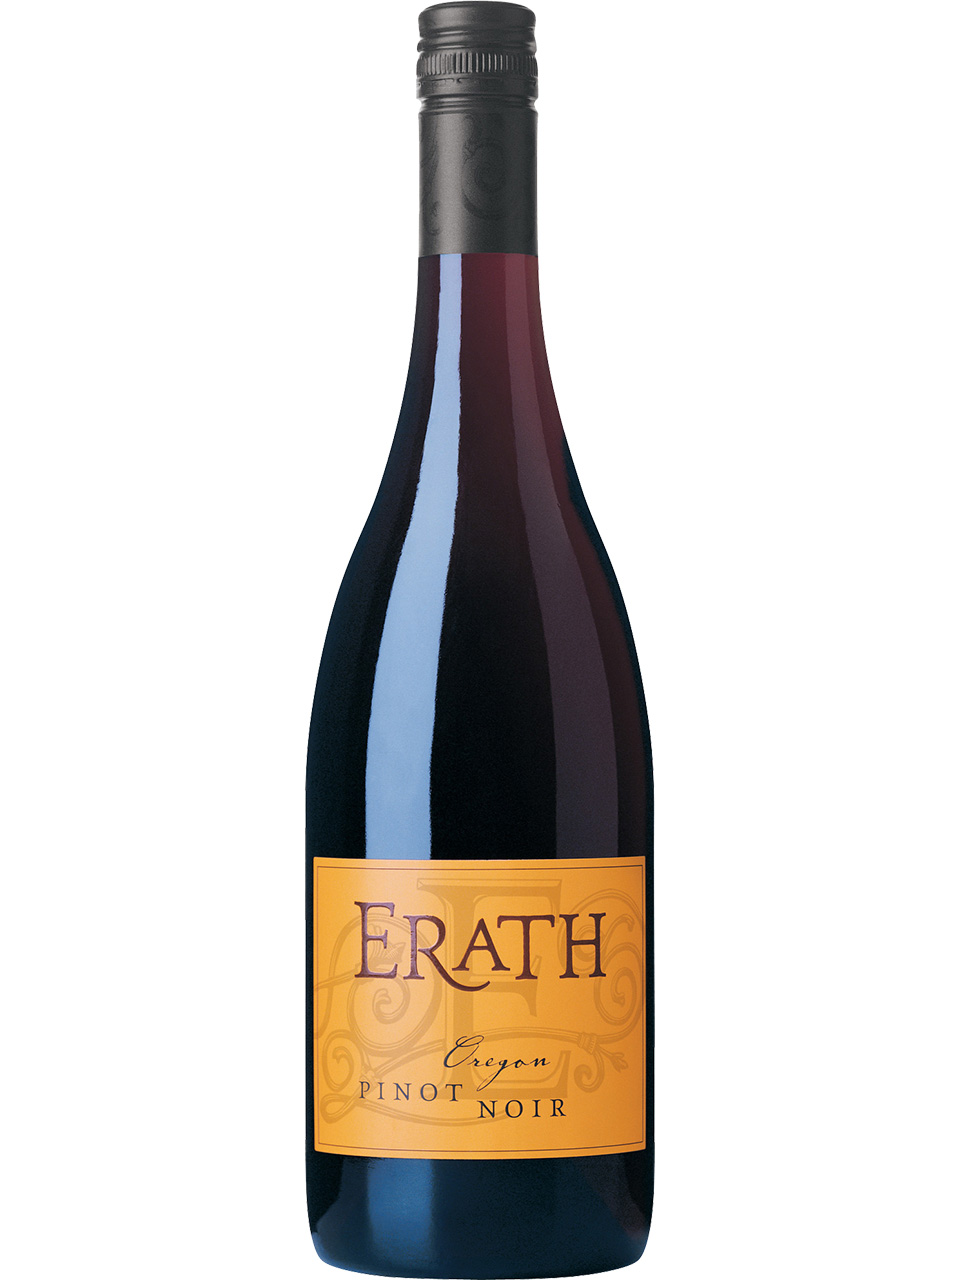 Erath Oregon Pinot Noir